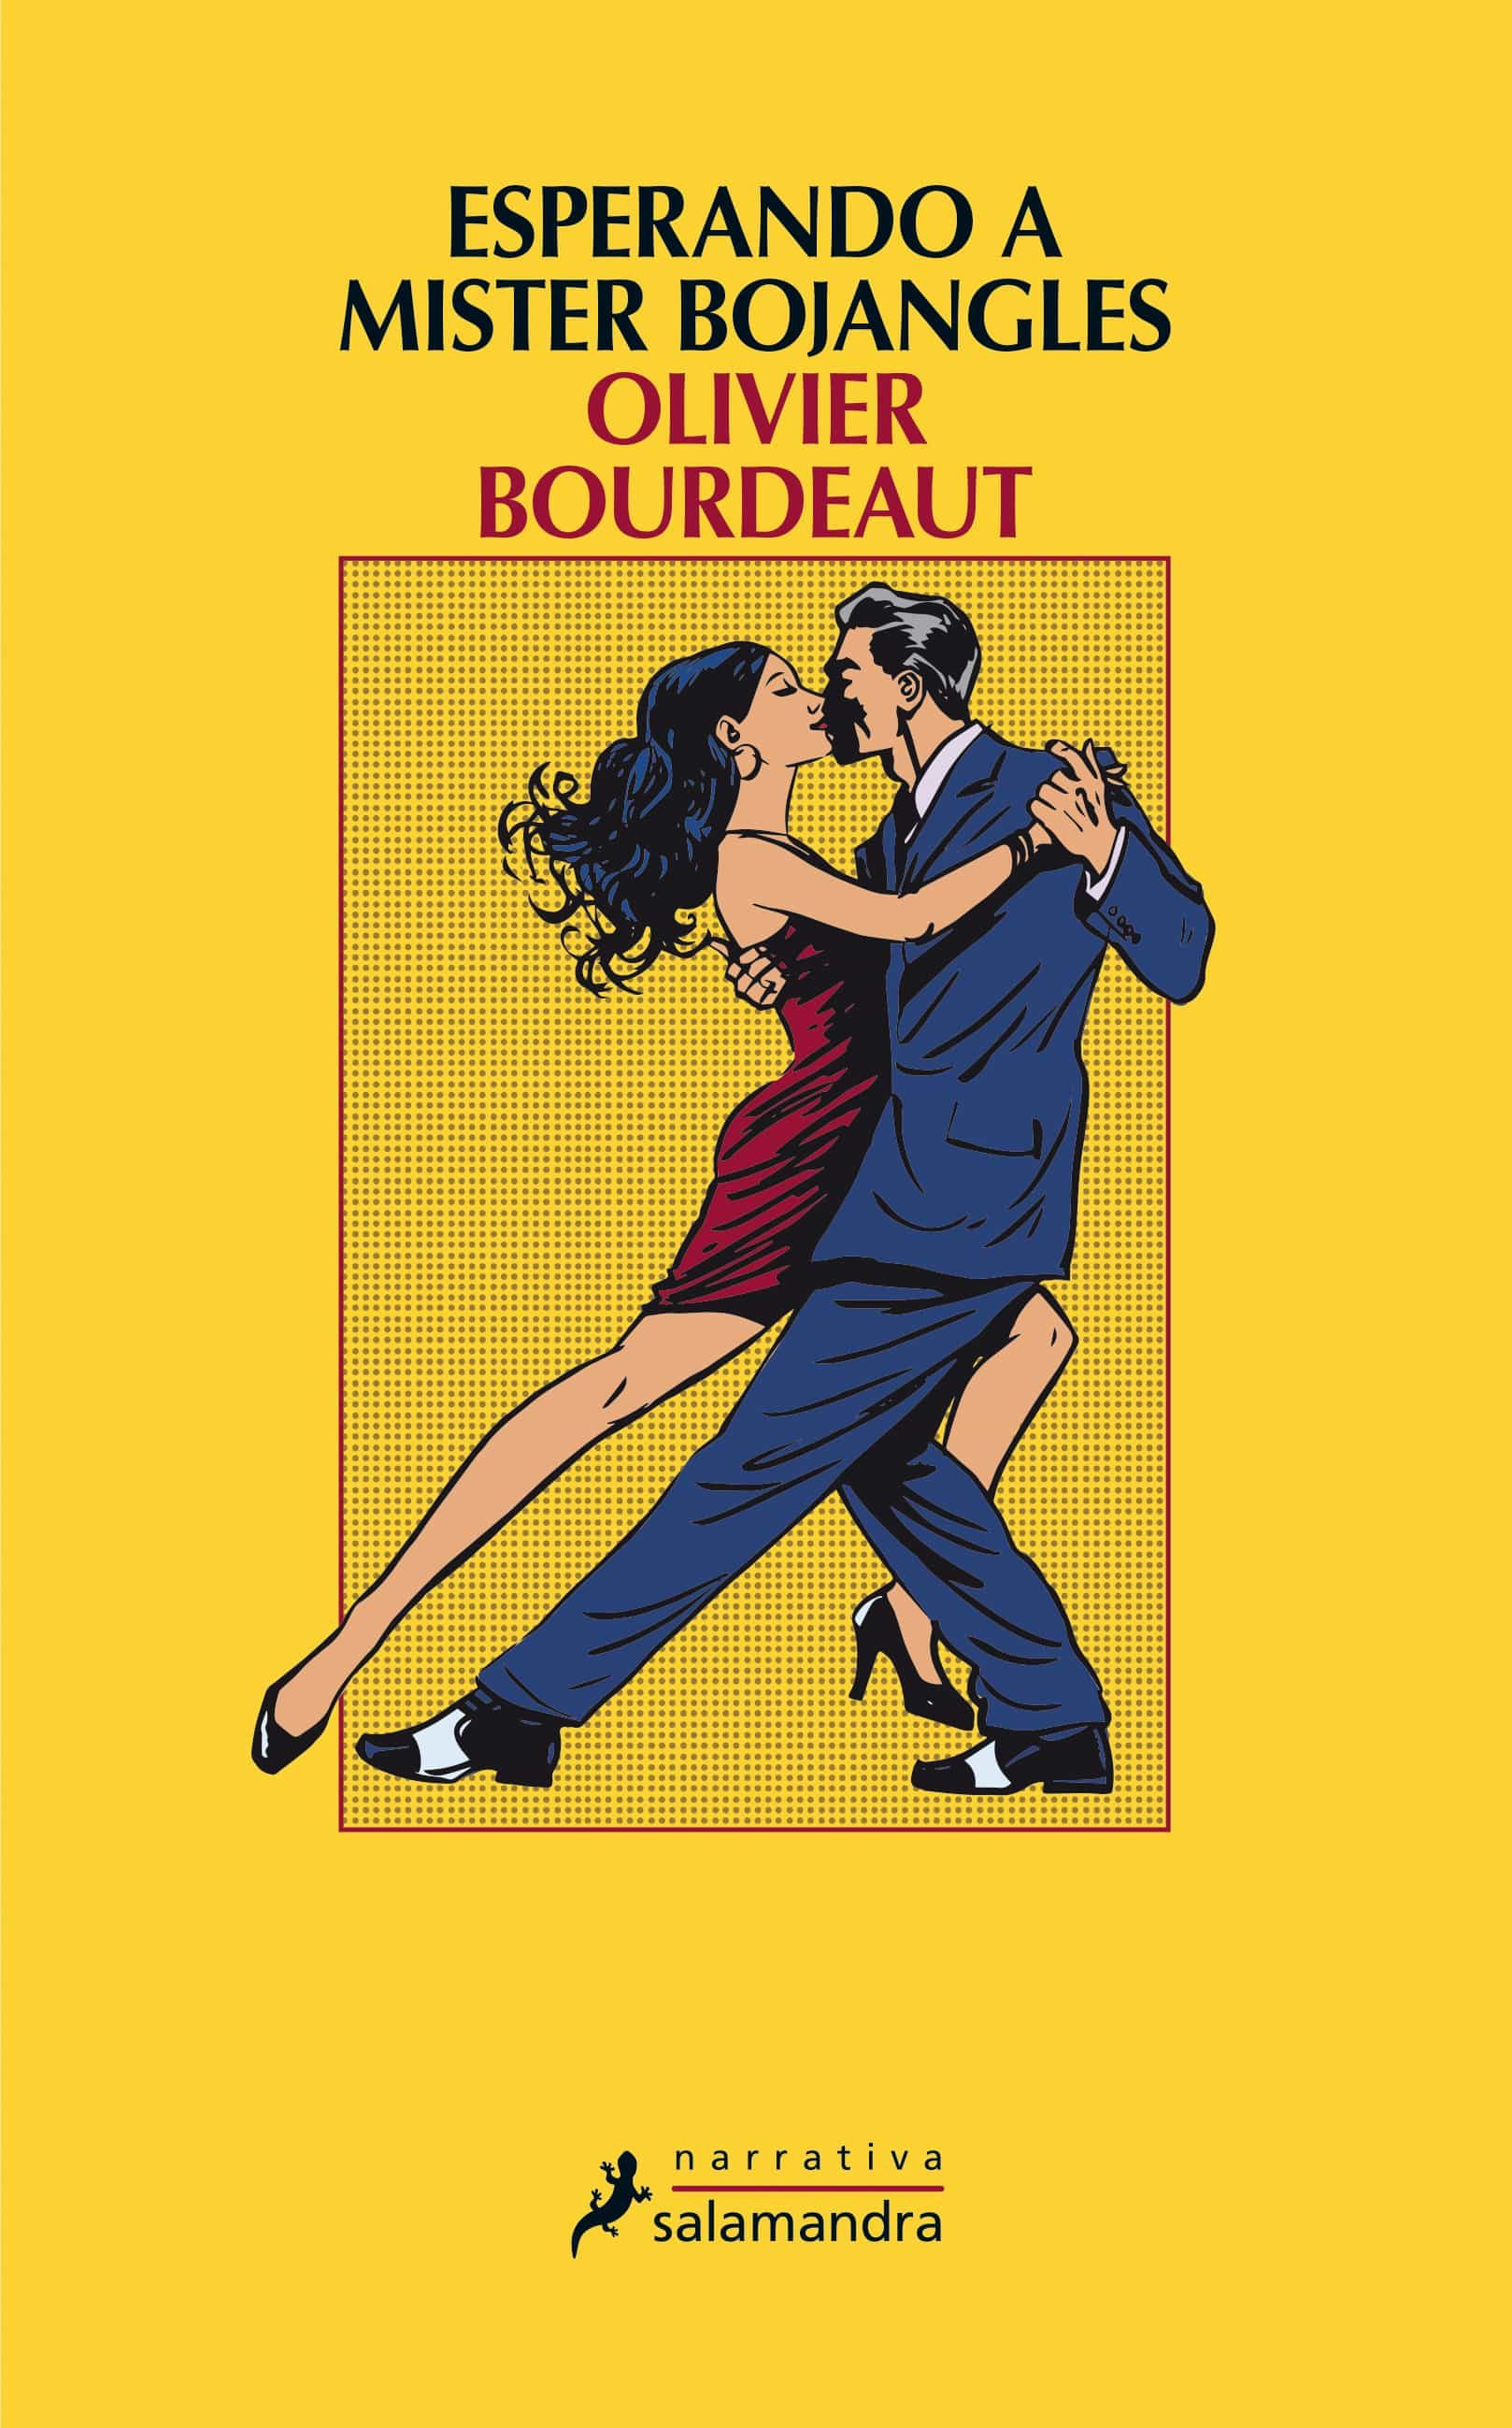 Esperando A Mister Bojangles - Bourdeaut Olivier